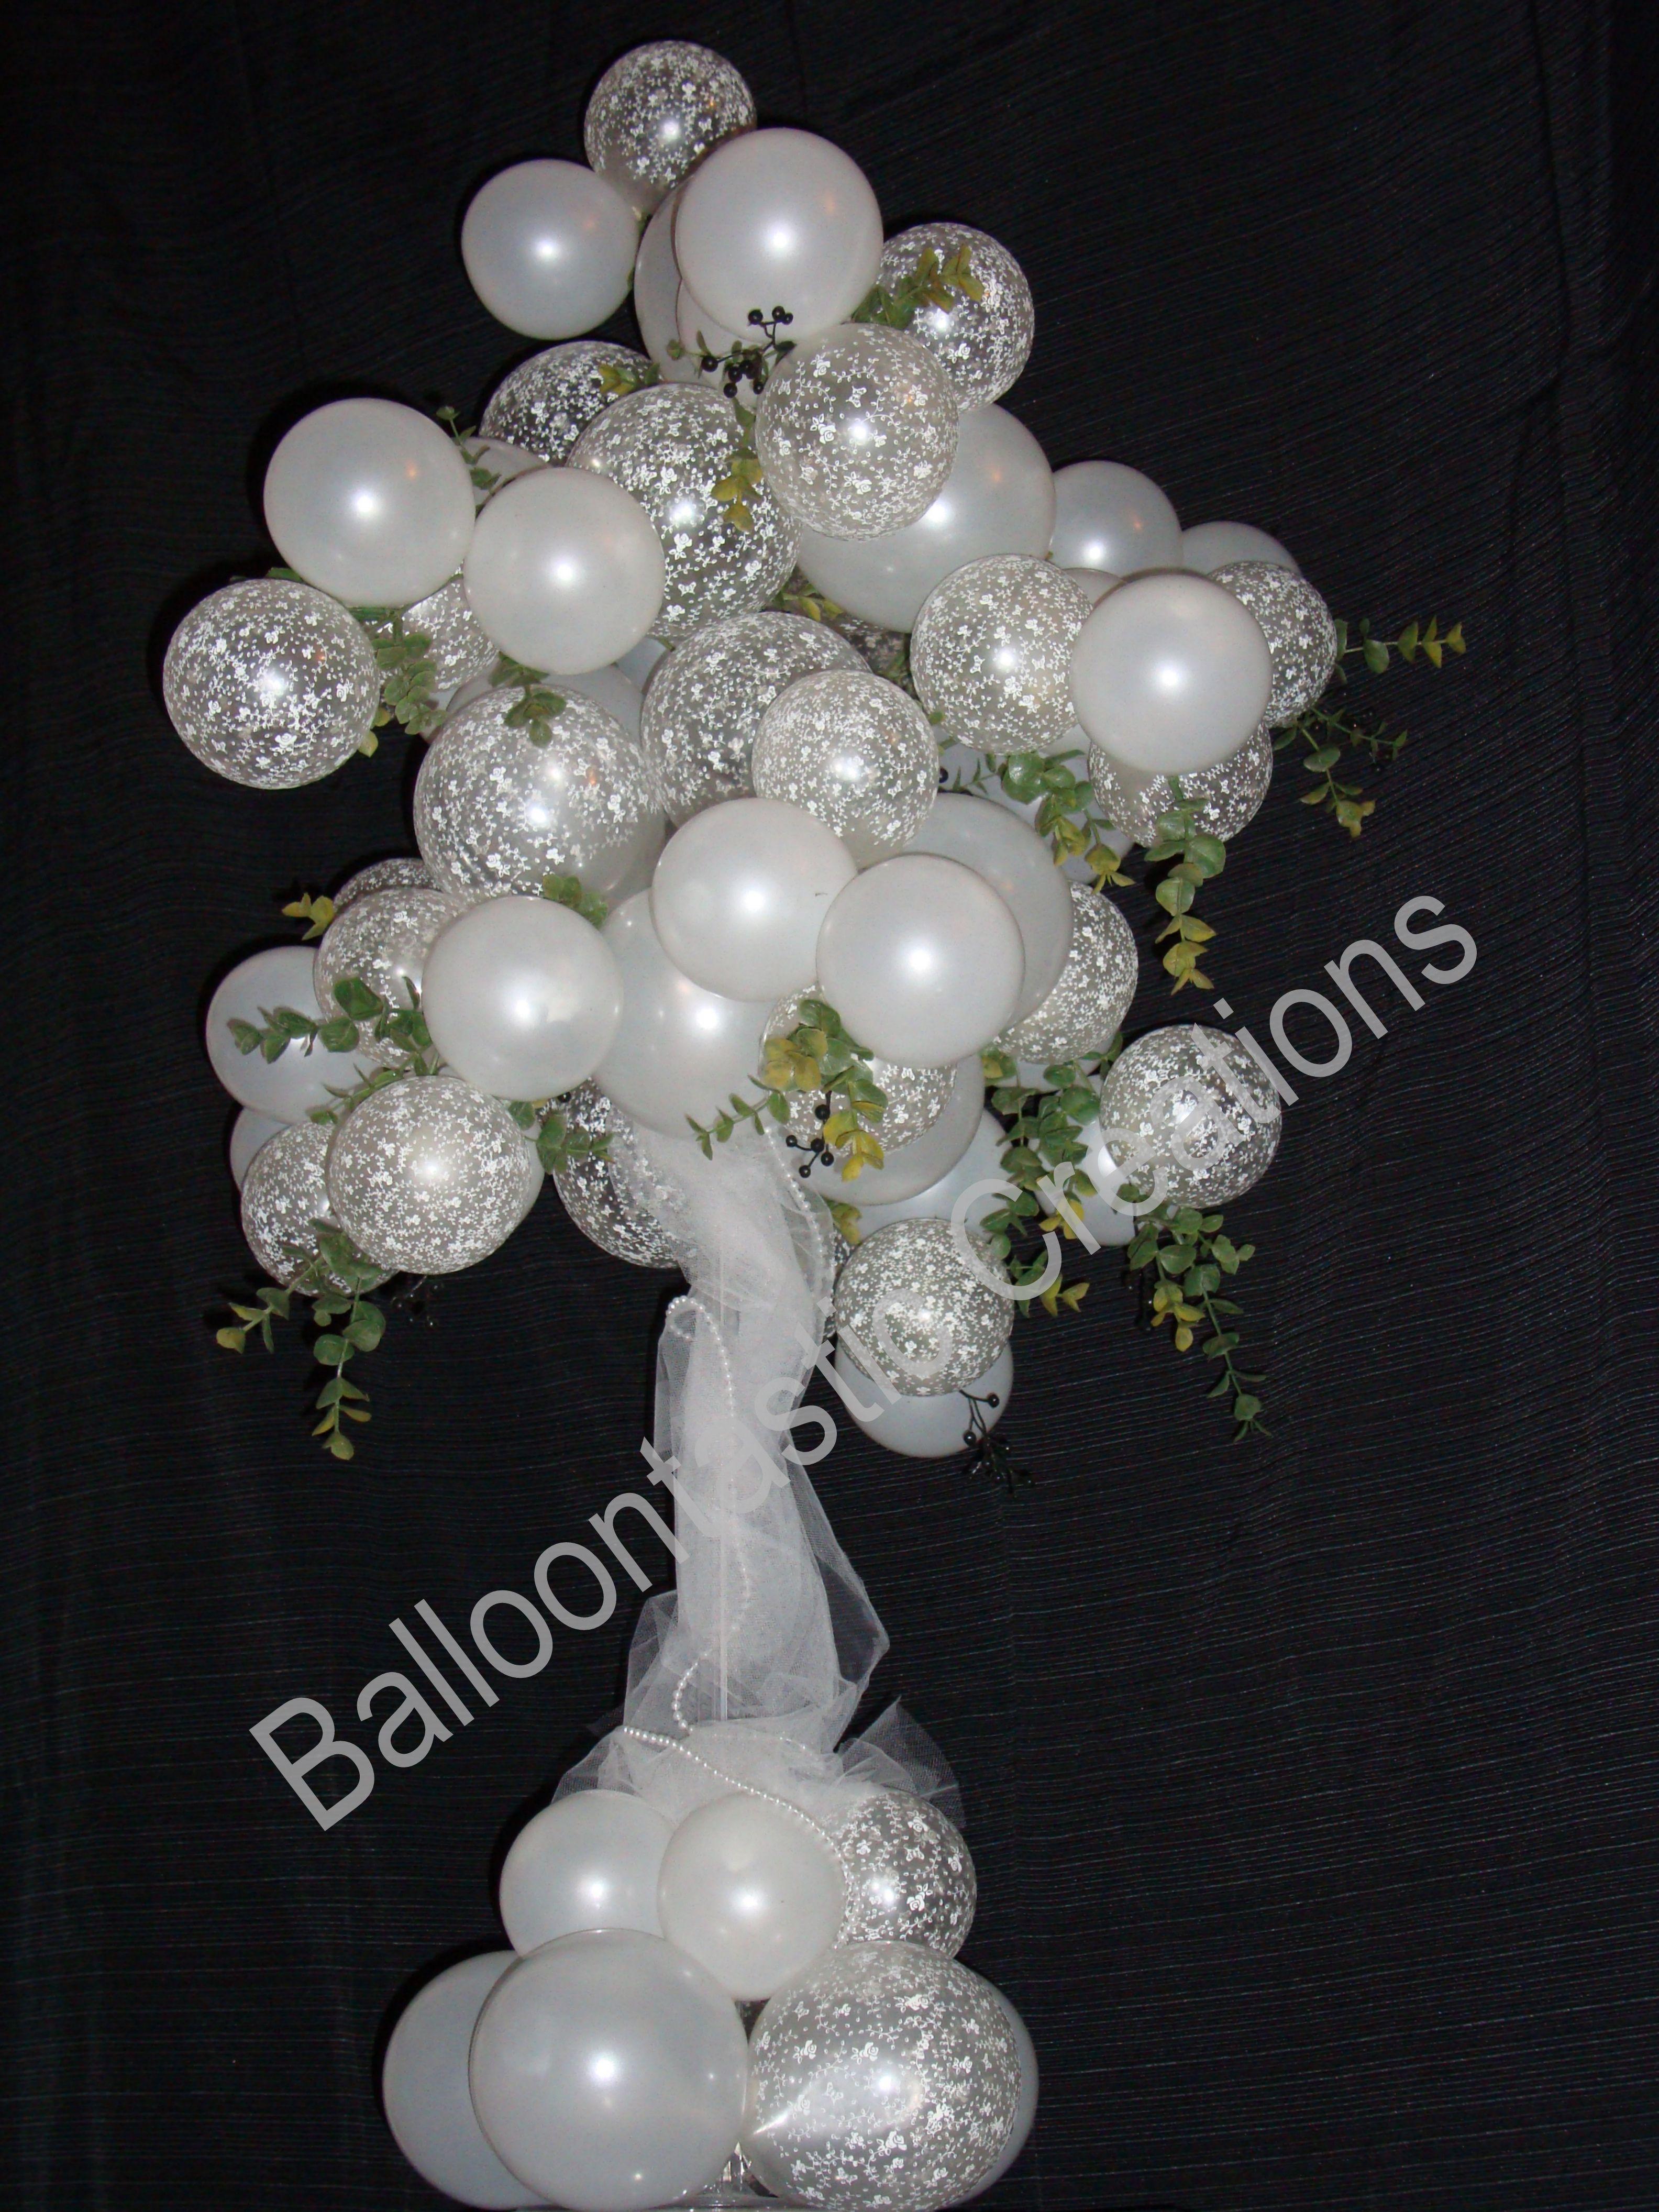 Wedding decoration ideas balloons  Wedding balloon decor  Balloons  Weddings  Pinterest  Wedding